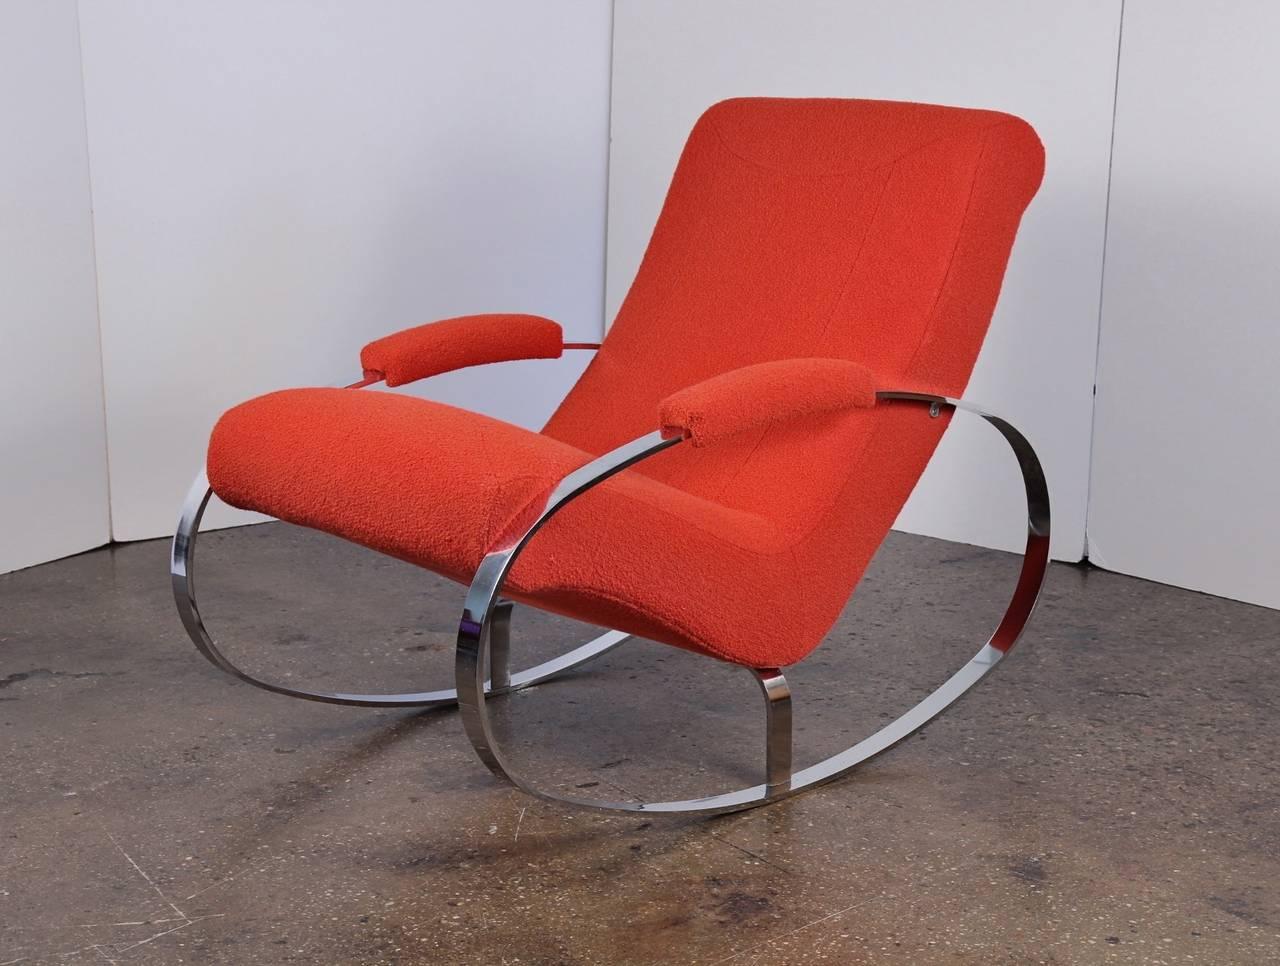 Phenomenal Modernist Chrome Milo Baughman Style Rocking Chair Lamtechconsult Wood Chair Design Ideas Lamtechconsultcom